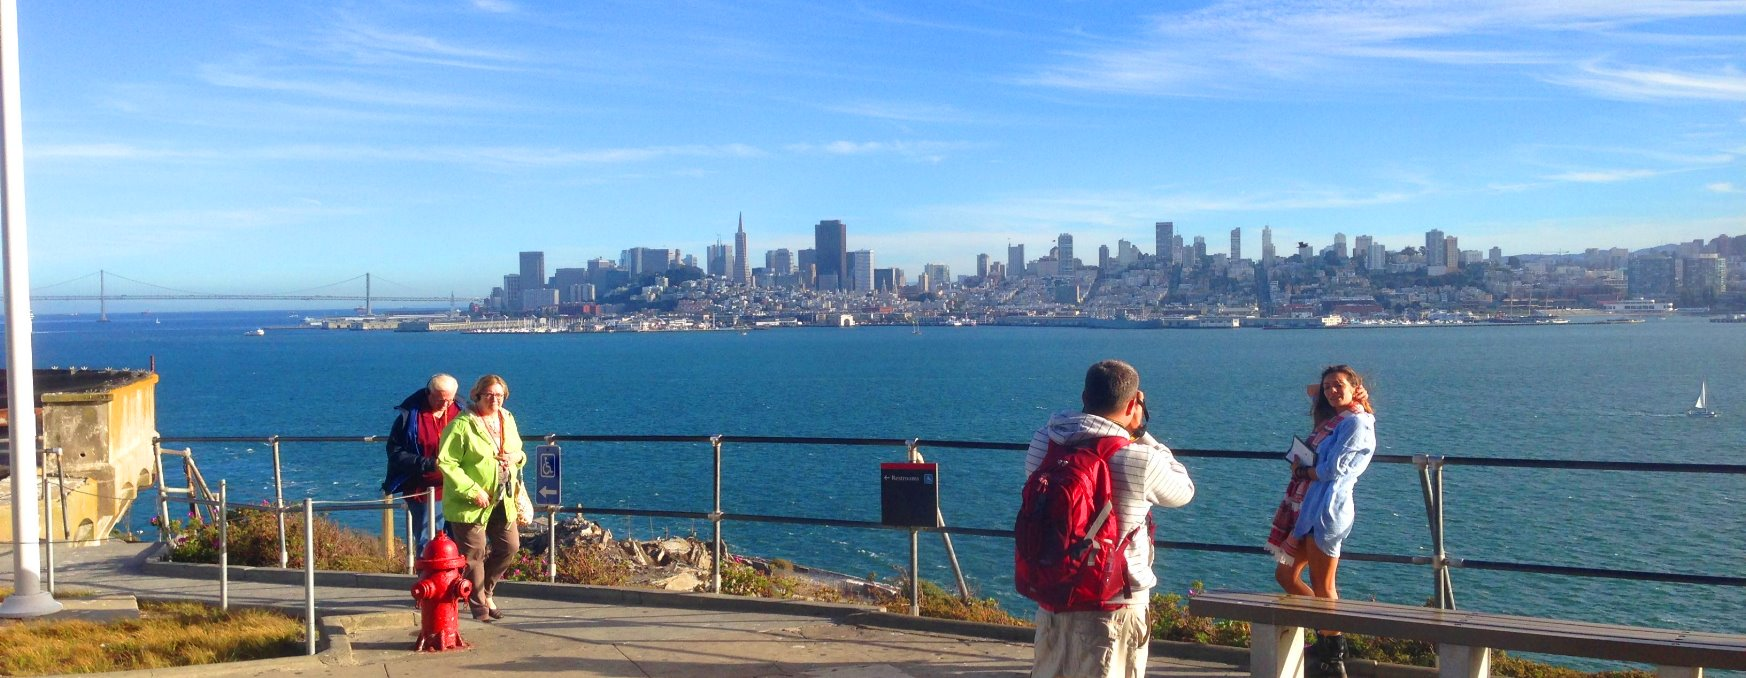 alcatraz_island_prison_tours_and_last_minute_ferry_tickets